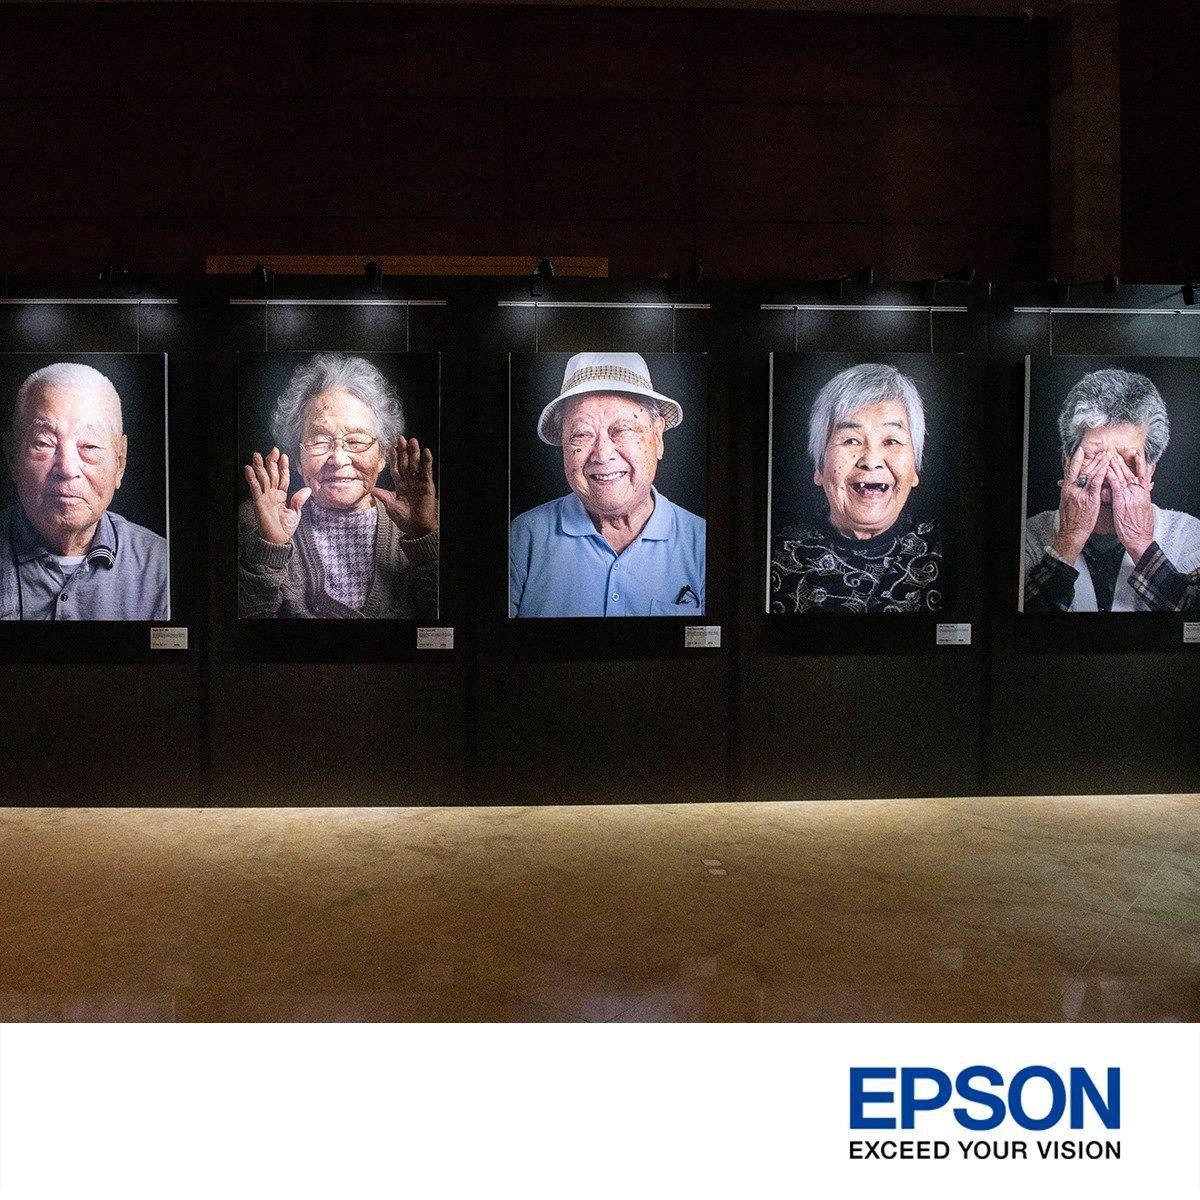 Epson printer photography exhibition singapore The fullerton hotel